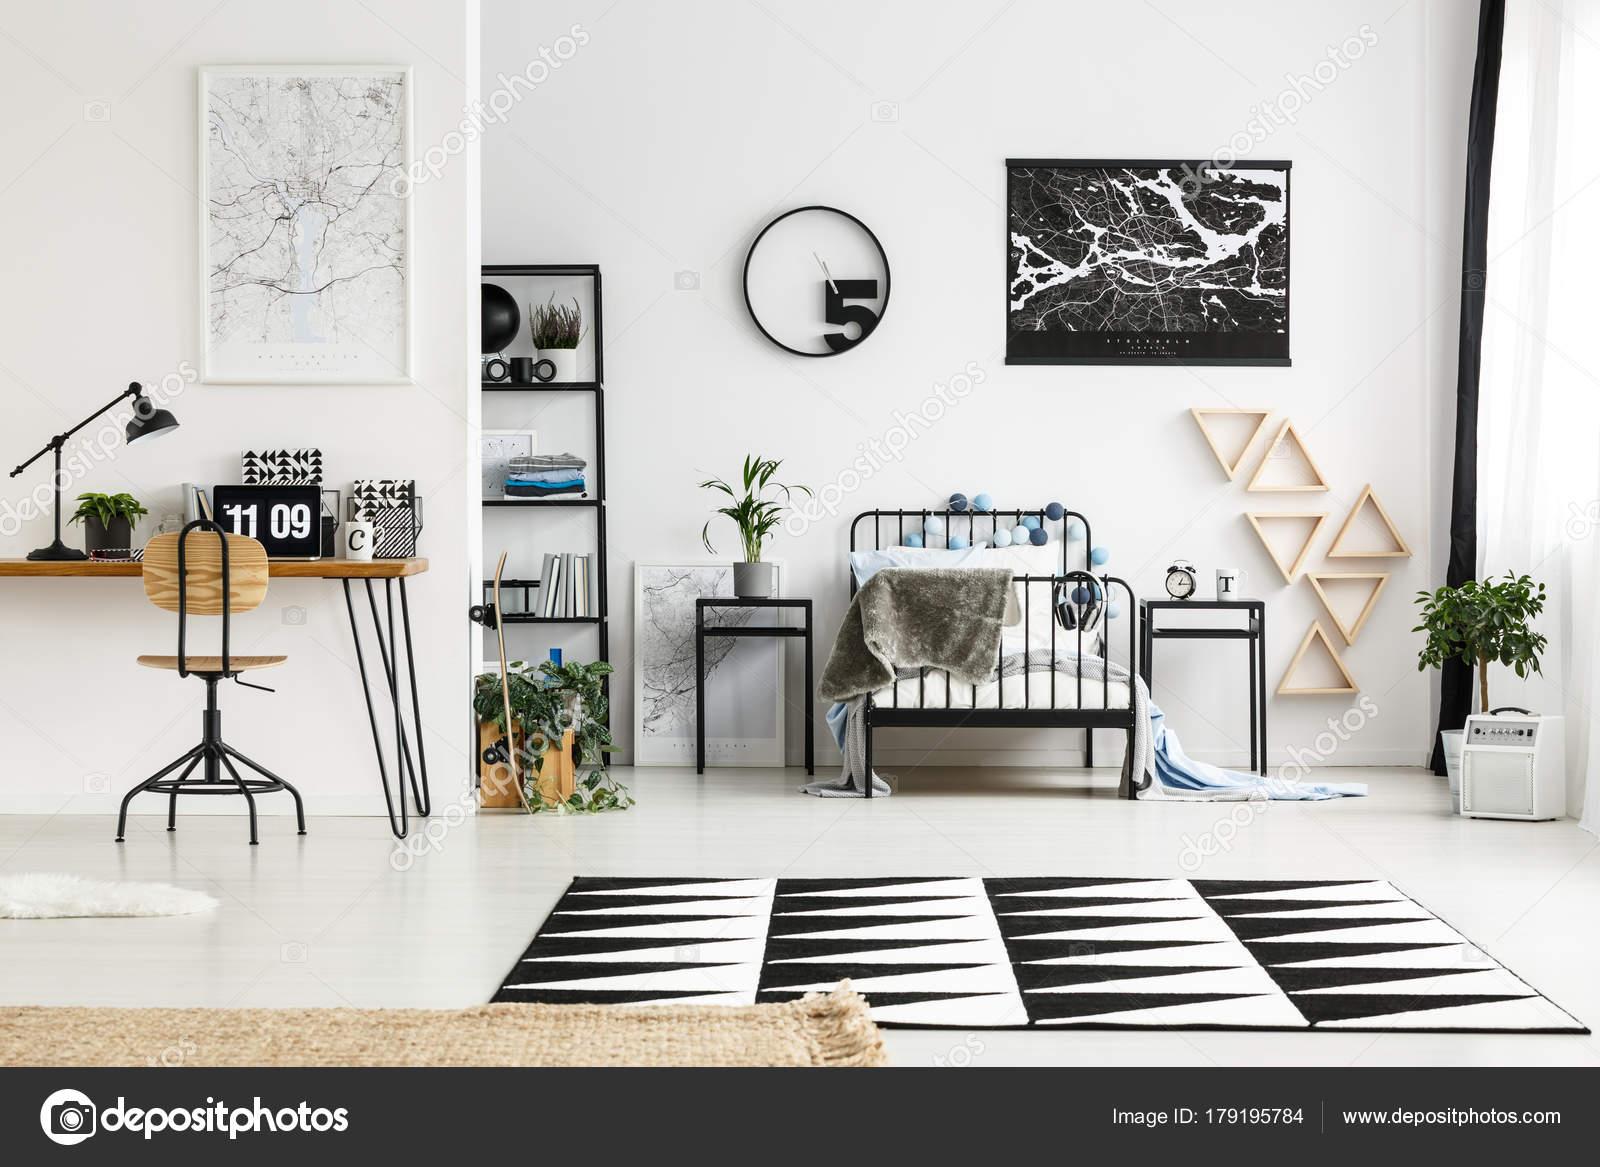 zwart-wit slaapkamer — Stockfoto © photographee.eu #179195784